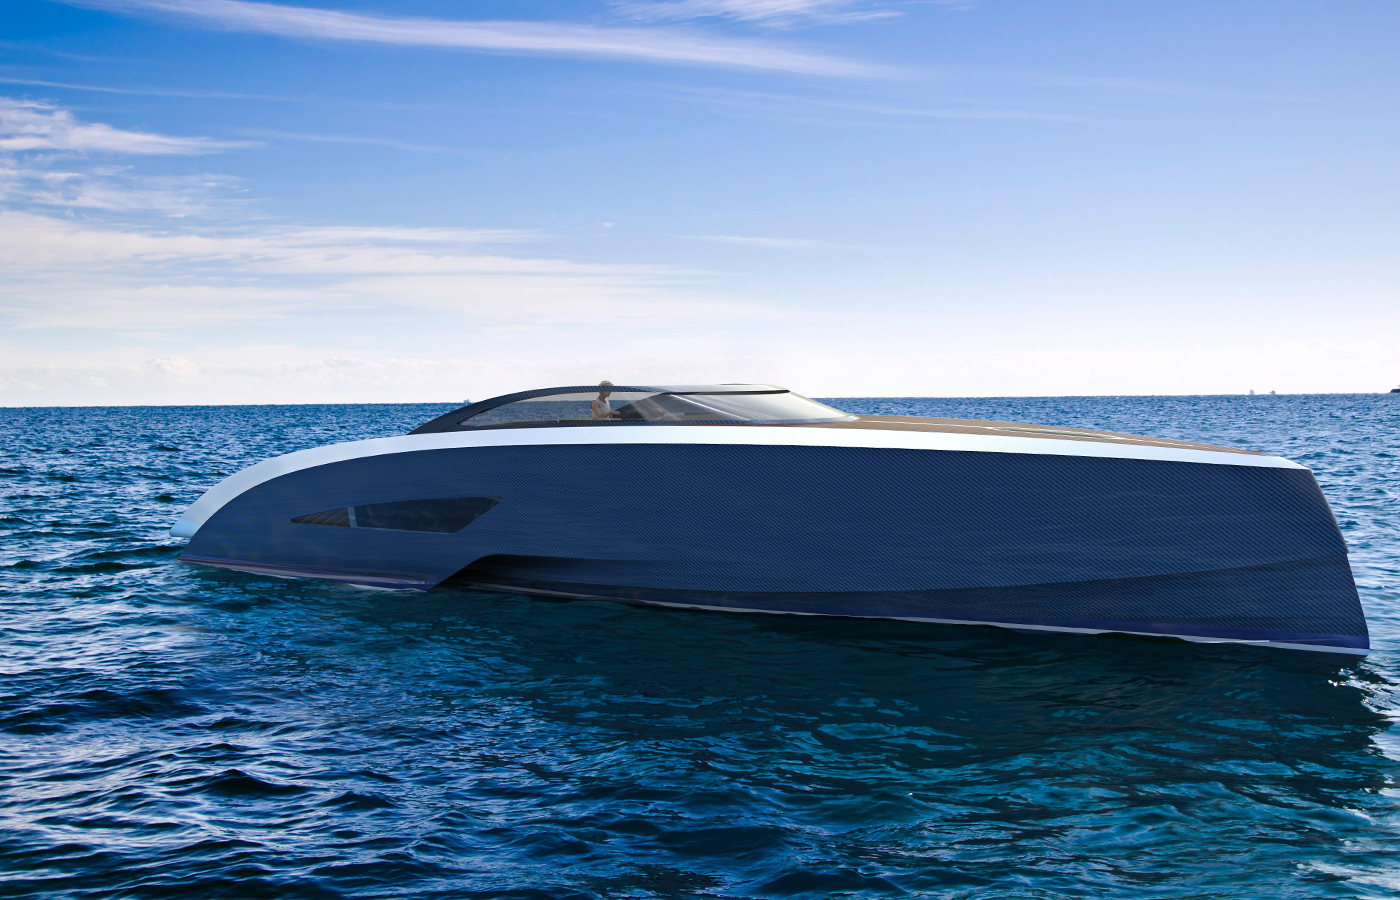 luxusyacht luxus-yacht yacht palmer johnson